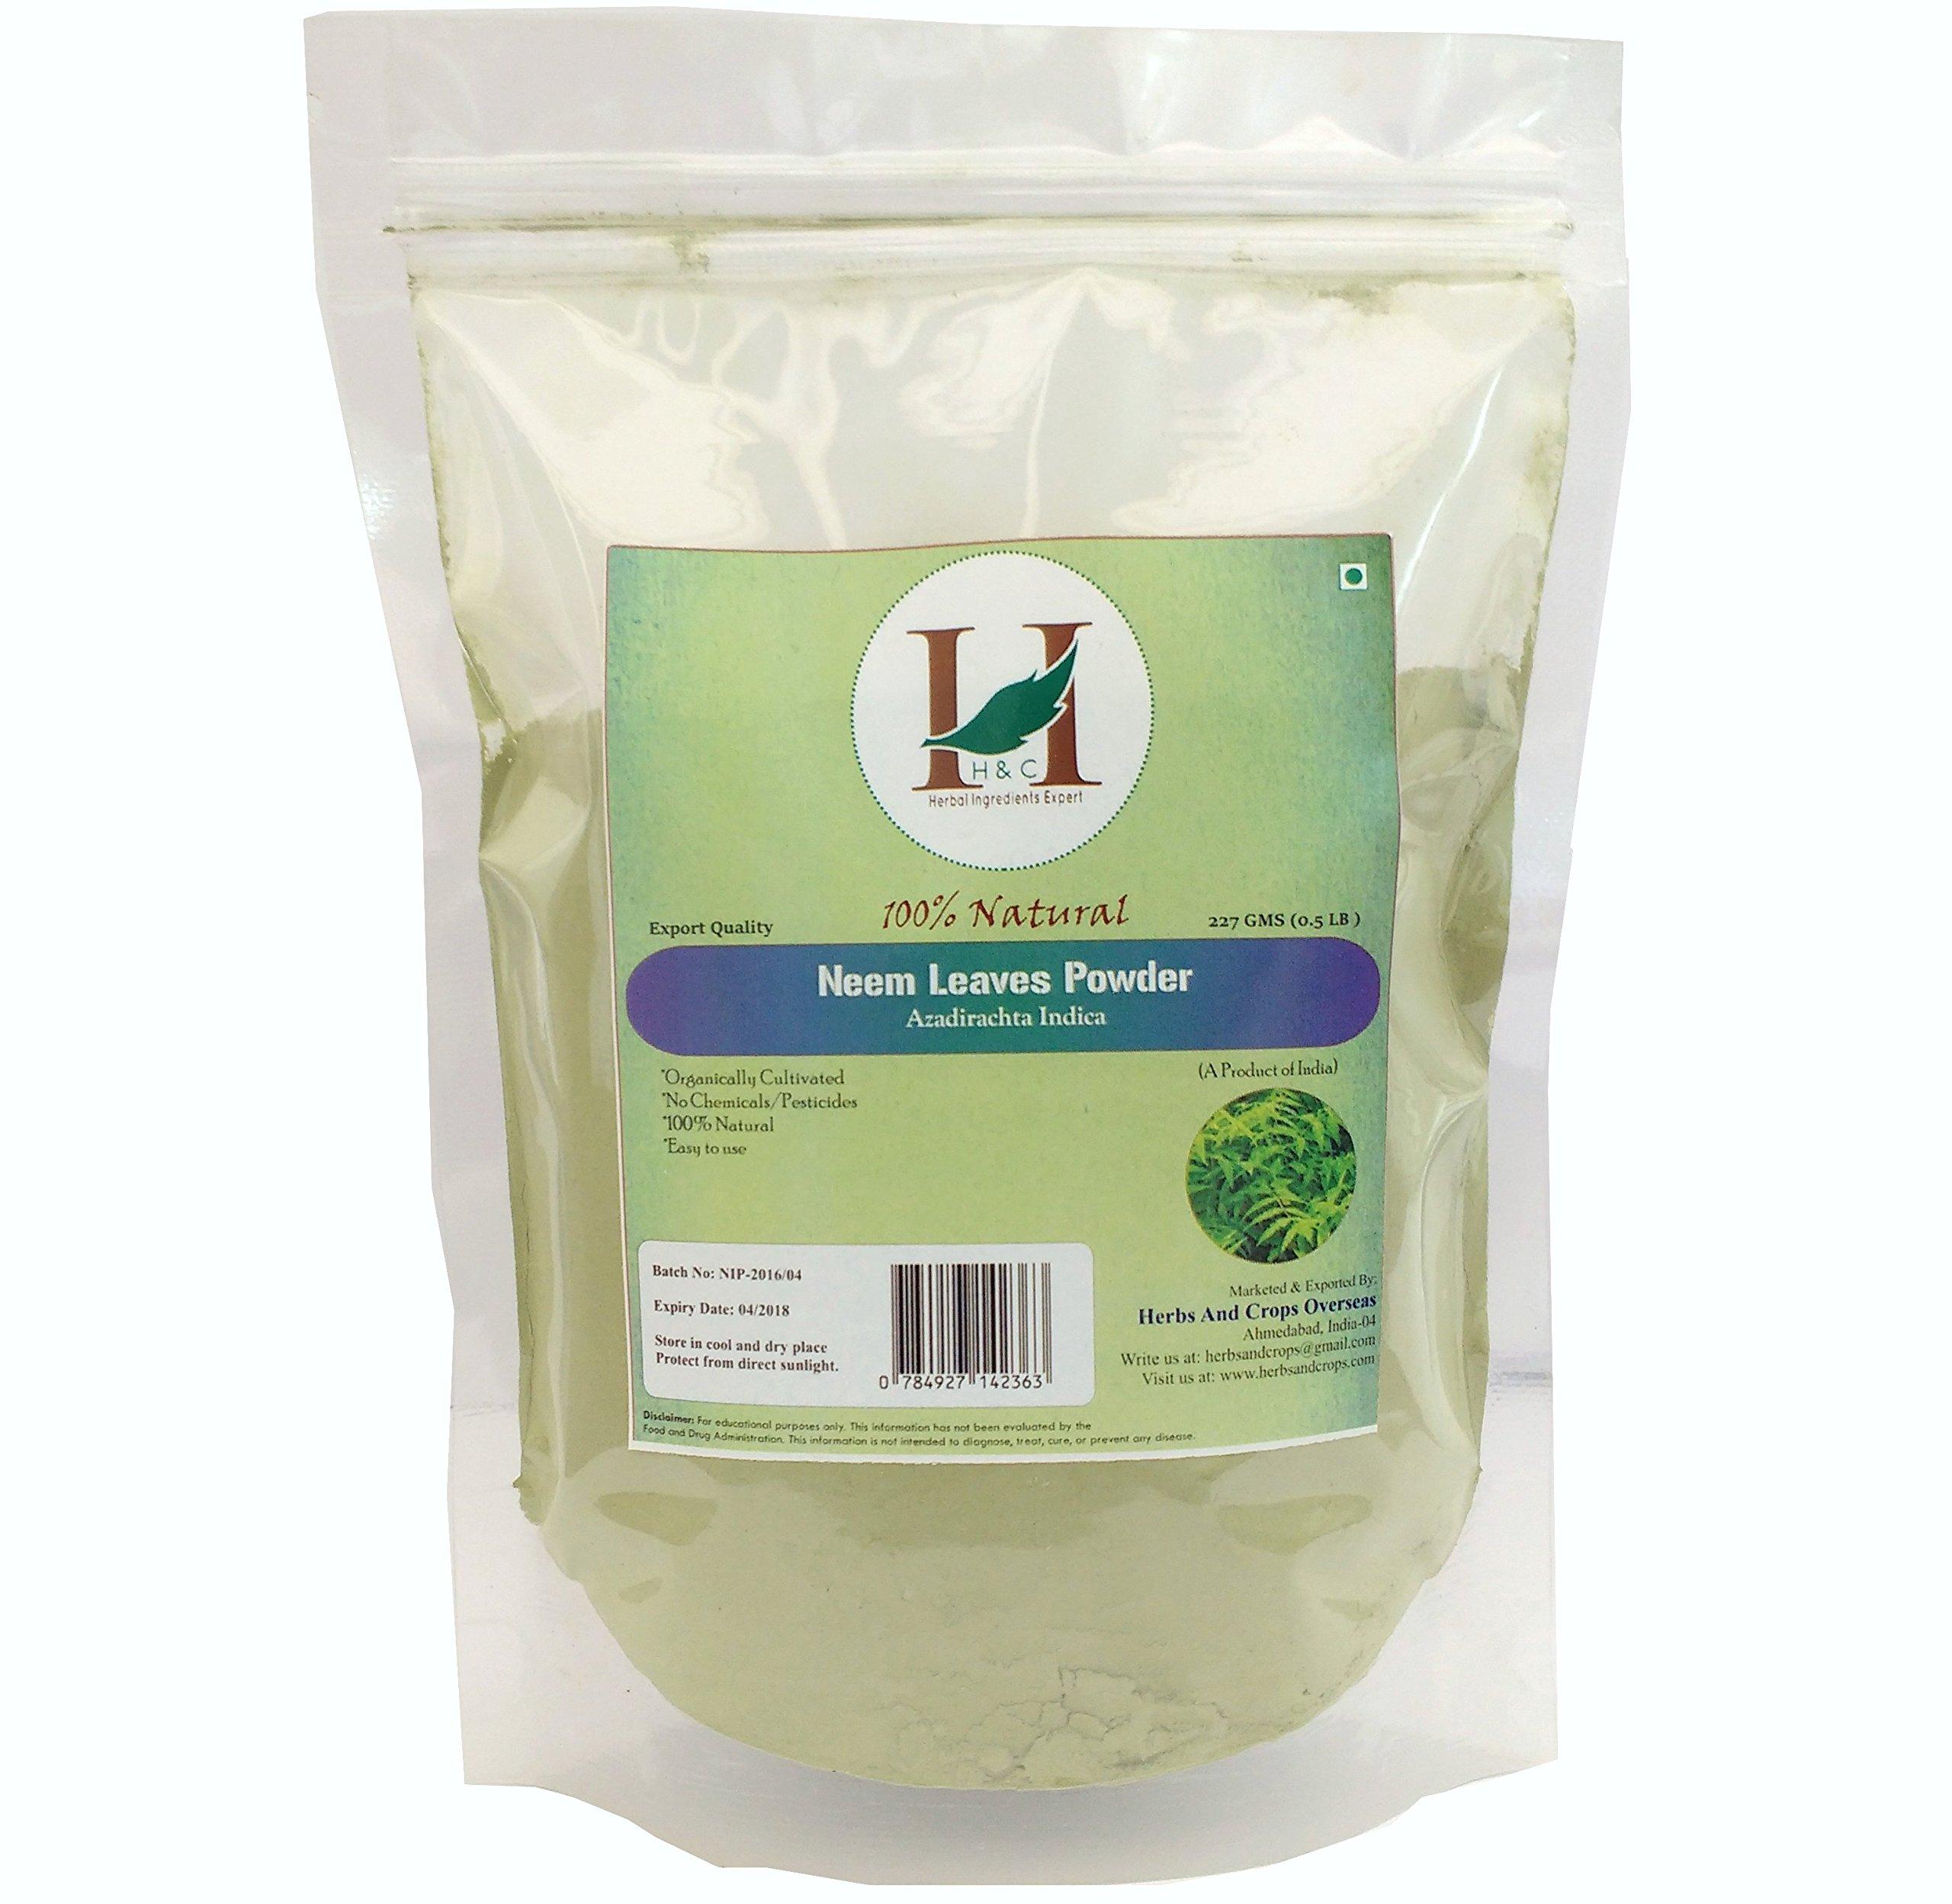 H&C Natural and Organically Grown Neem Leaves Powder, 227 Grams (1/2 lb)